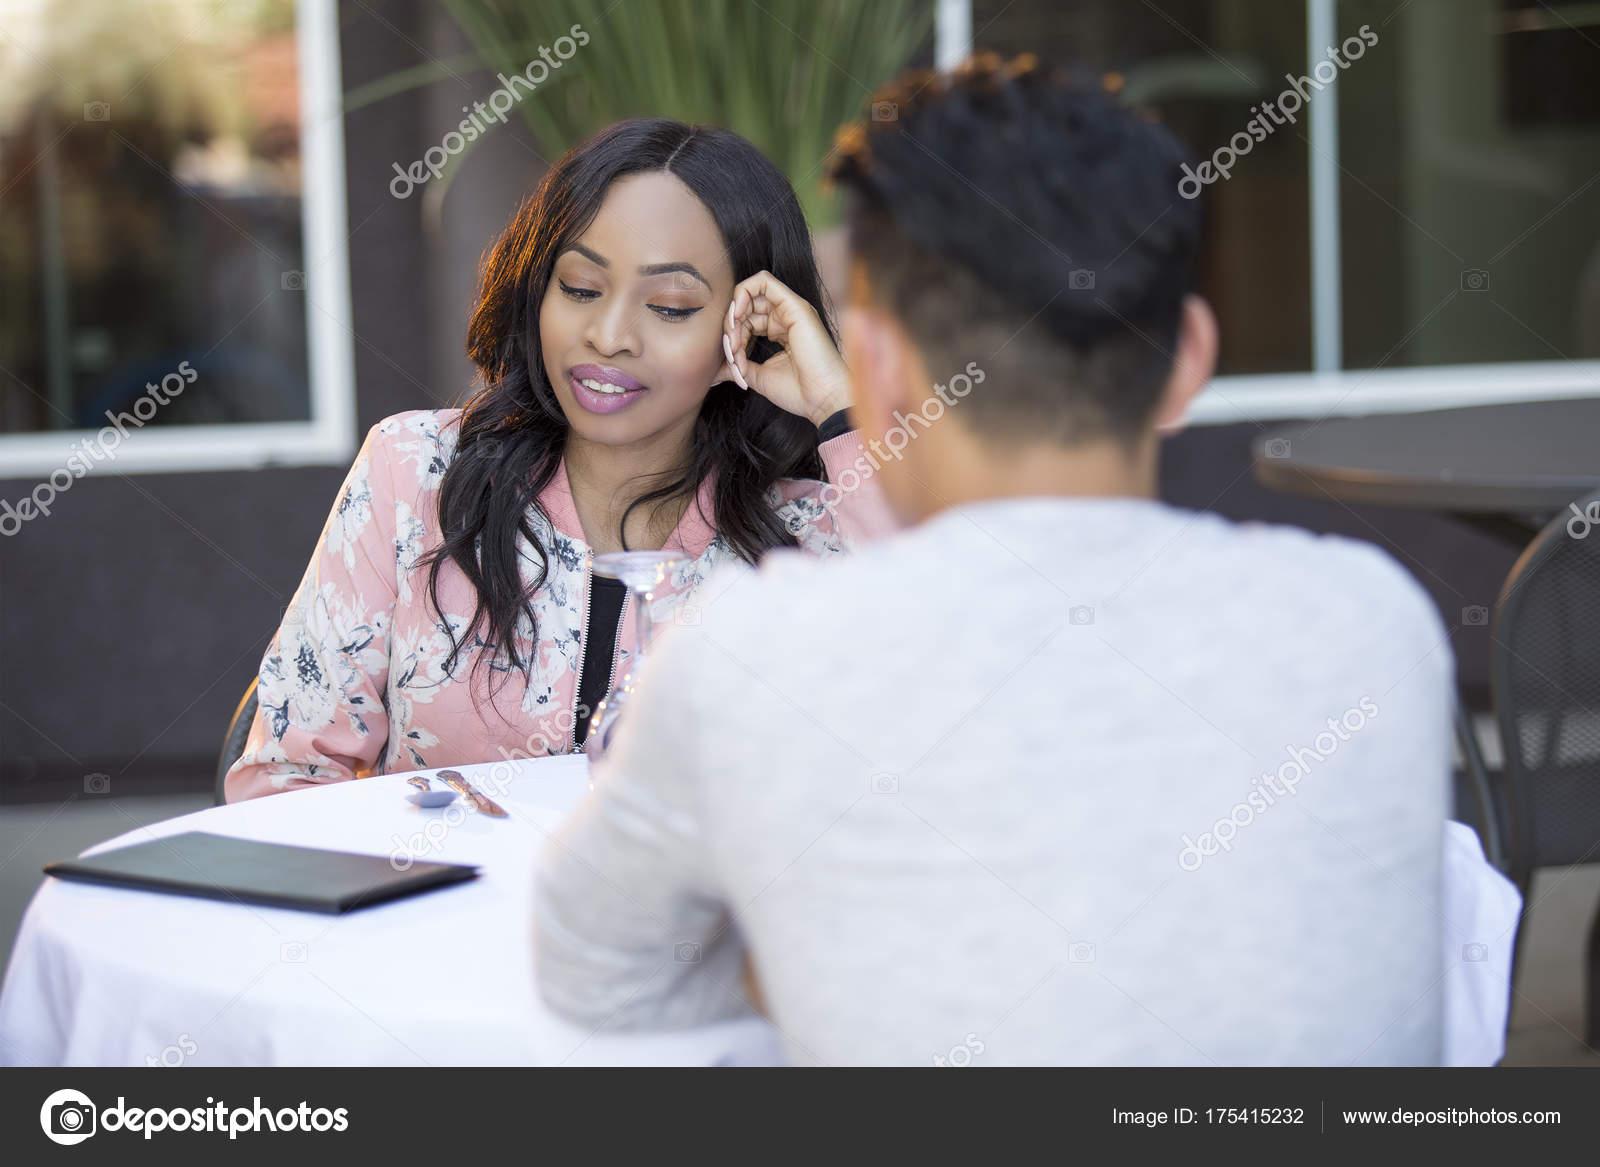 donna a velocità datazioneServizi di dating online gratuiti in Sudafrica